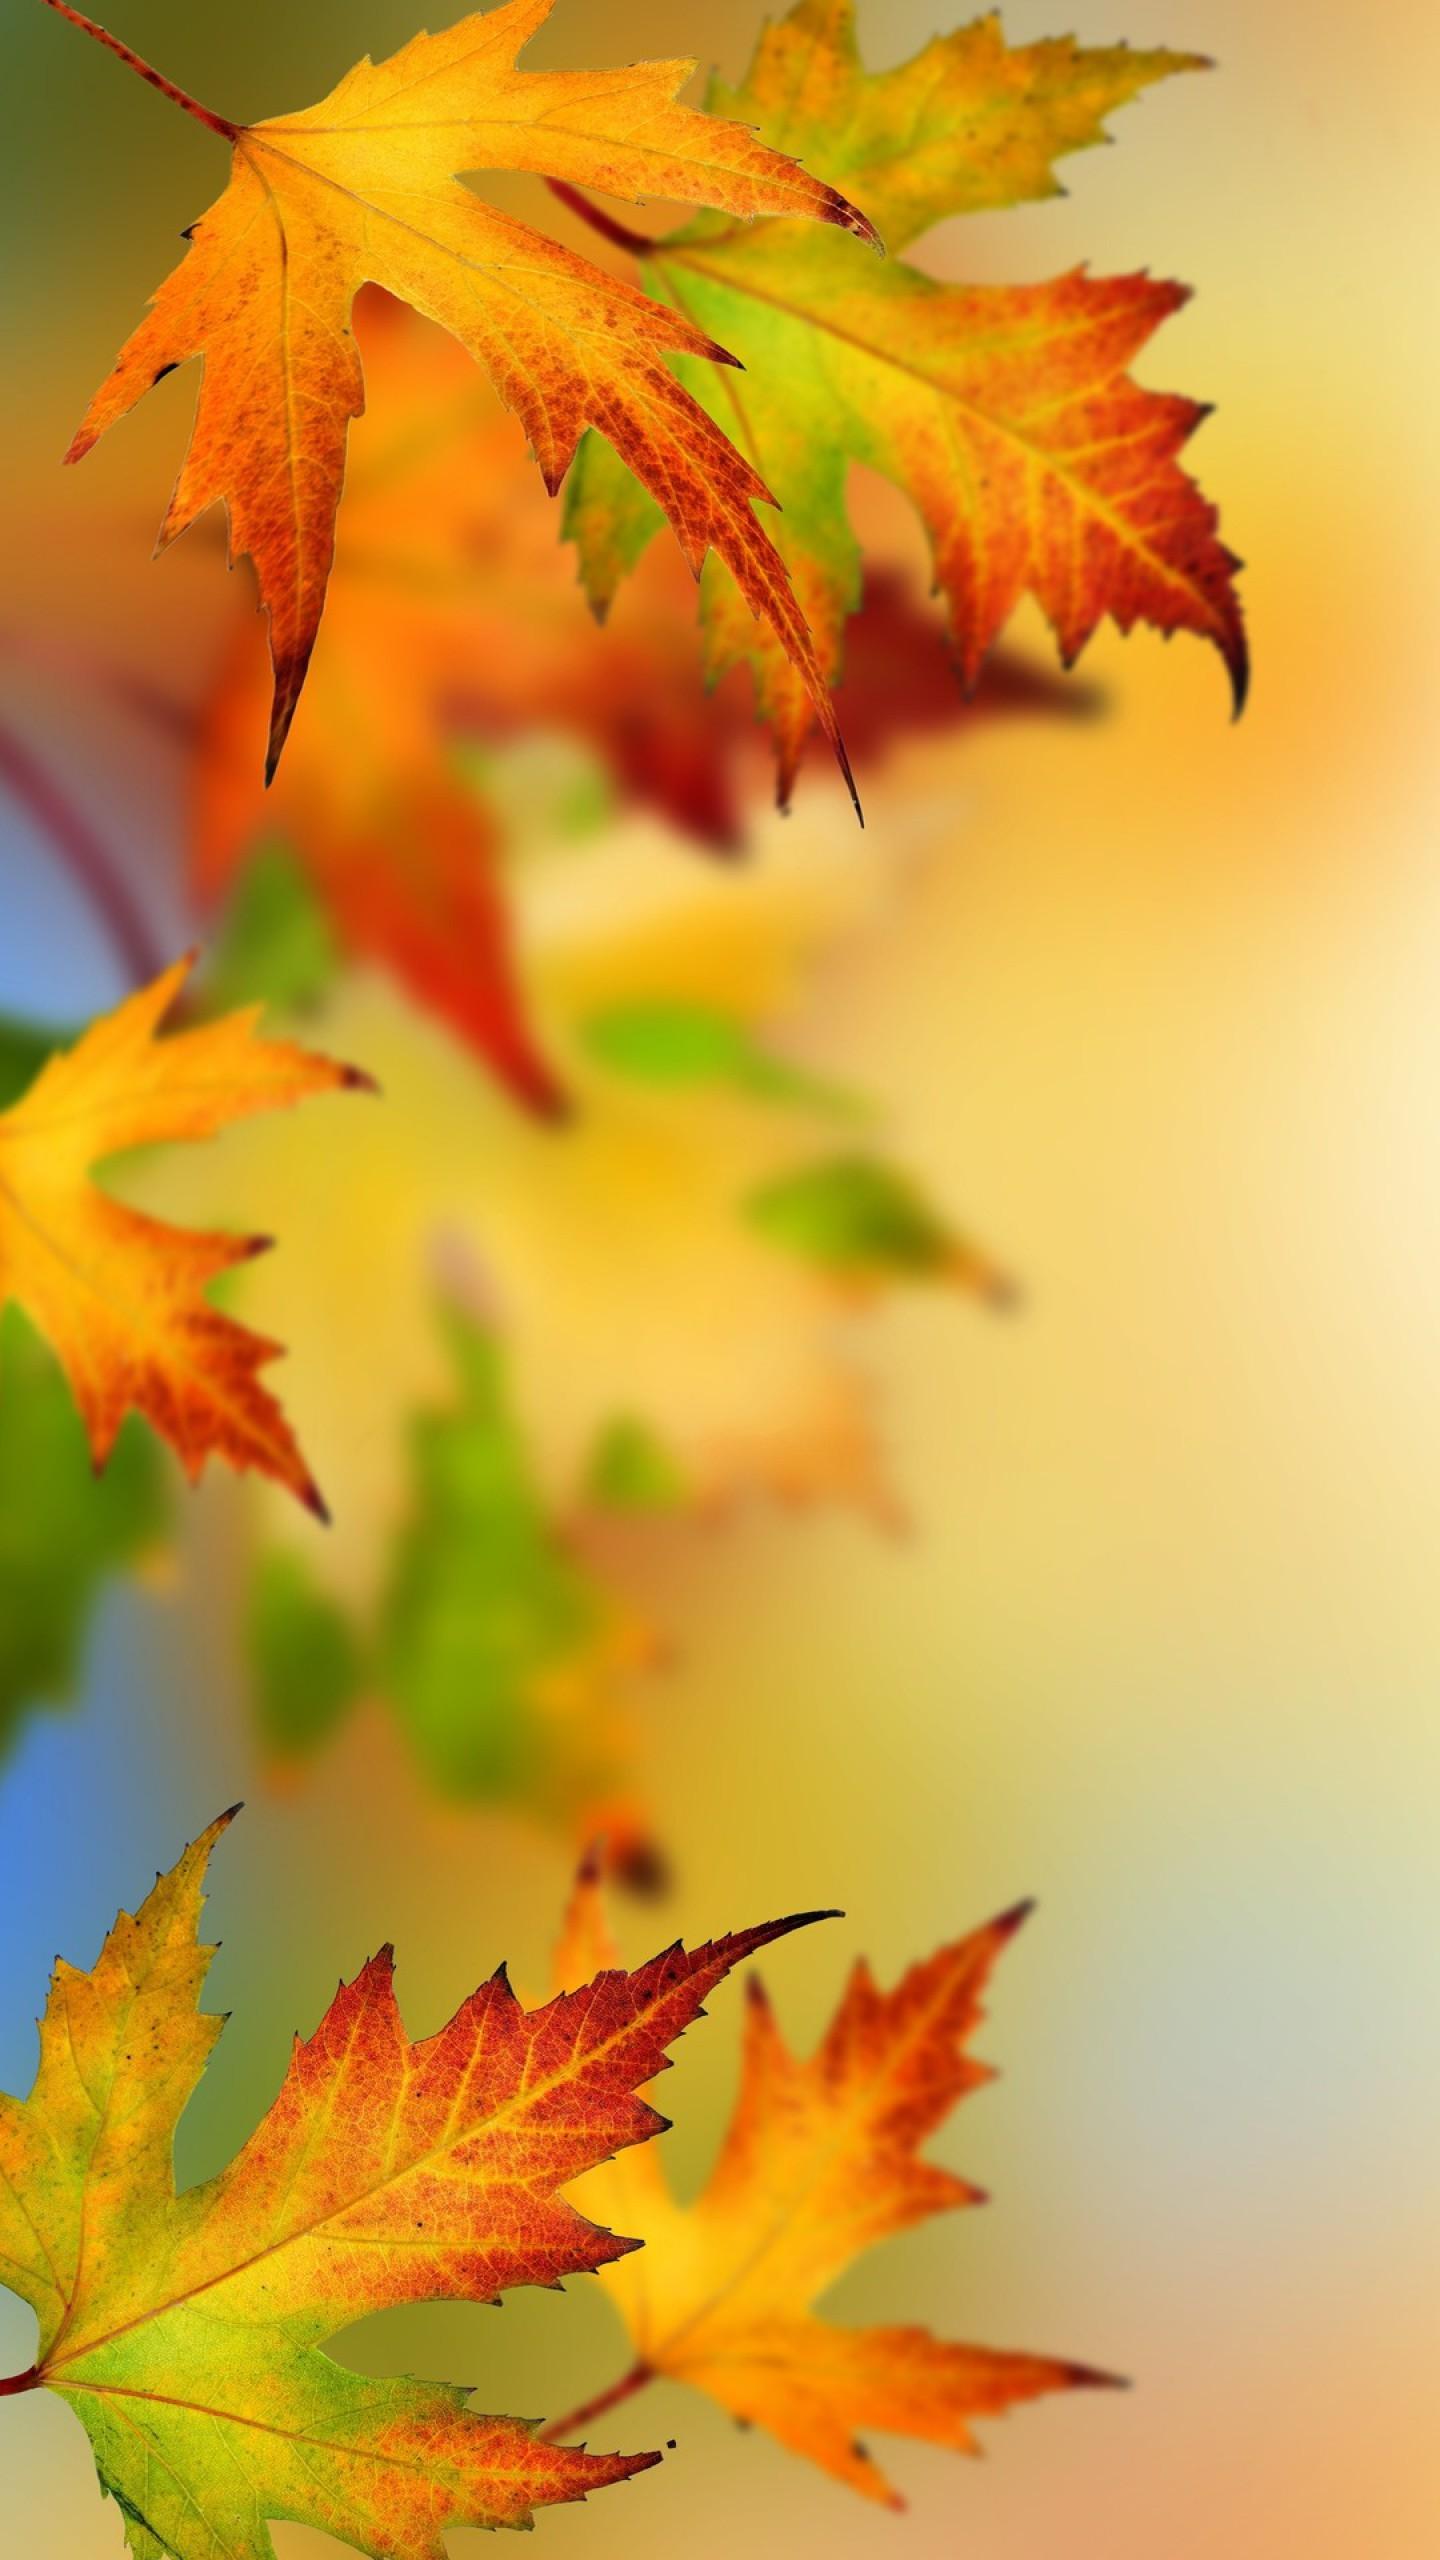 Autumn leaf wallpaper 68 images - Samsung galaxy s7 wallpaper download ...